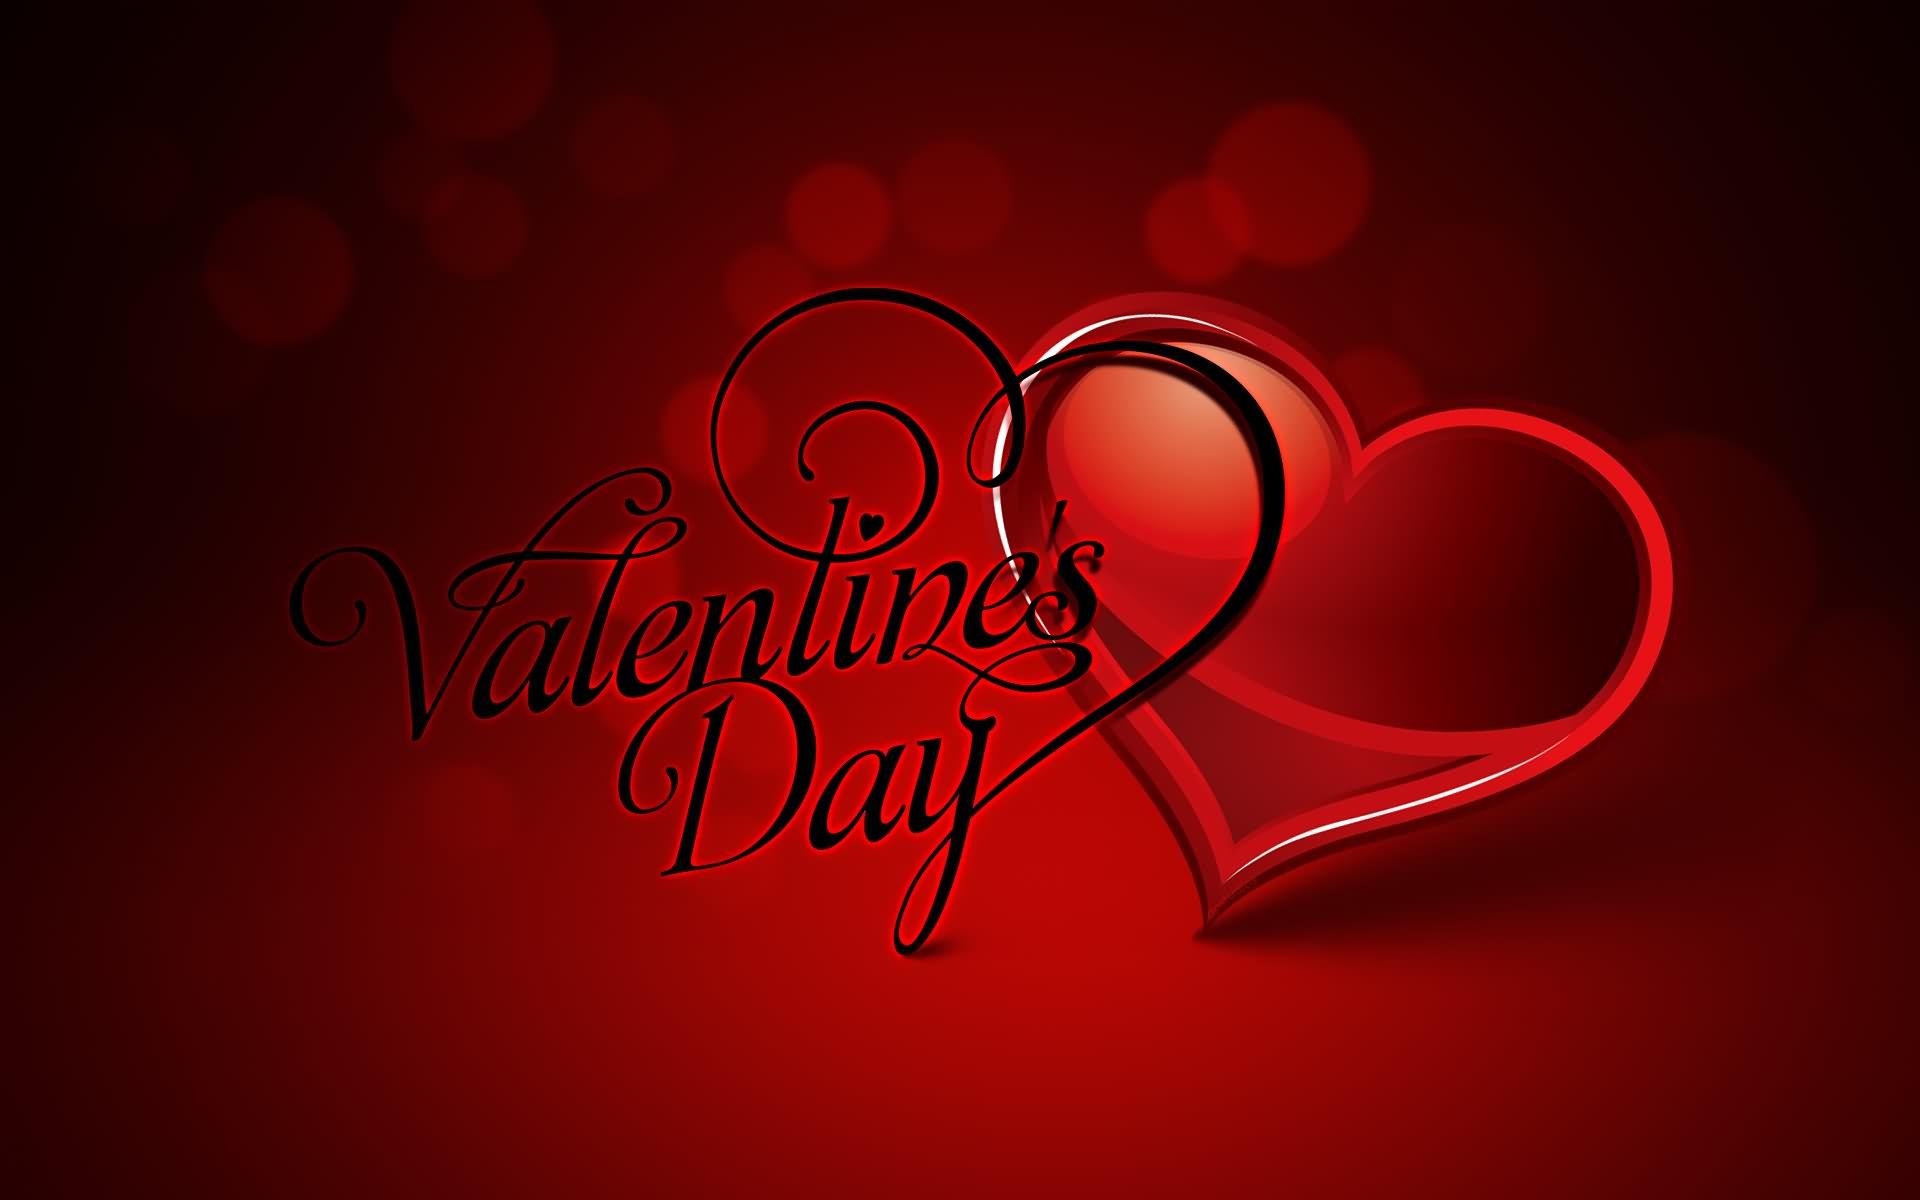 Valentine's Day Heart Wallpaper